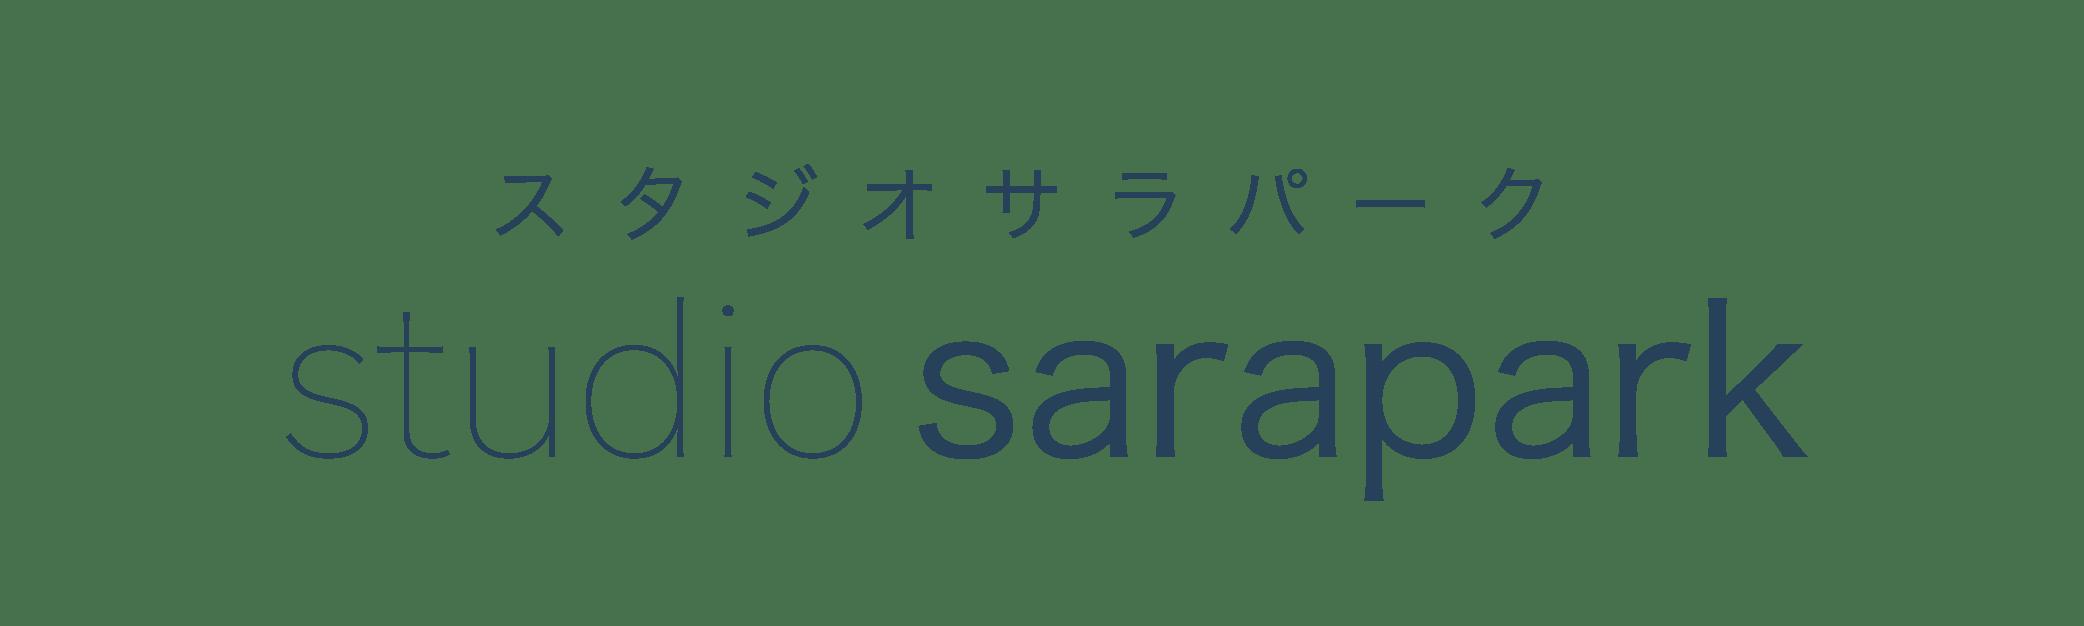 studio sarapark(スタジオサラパーク)